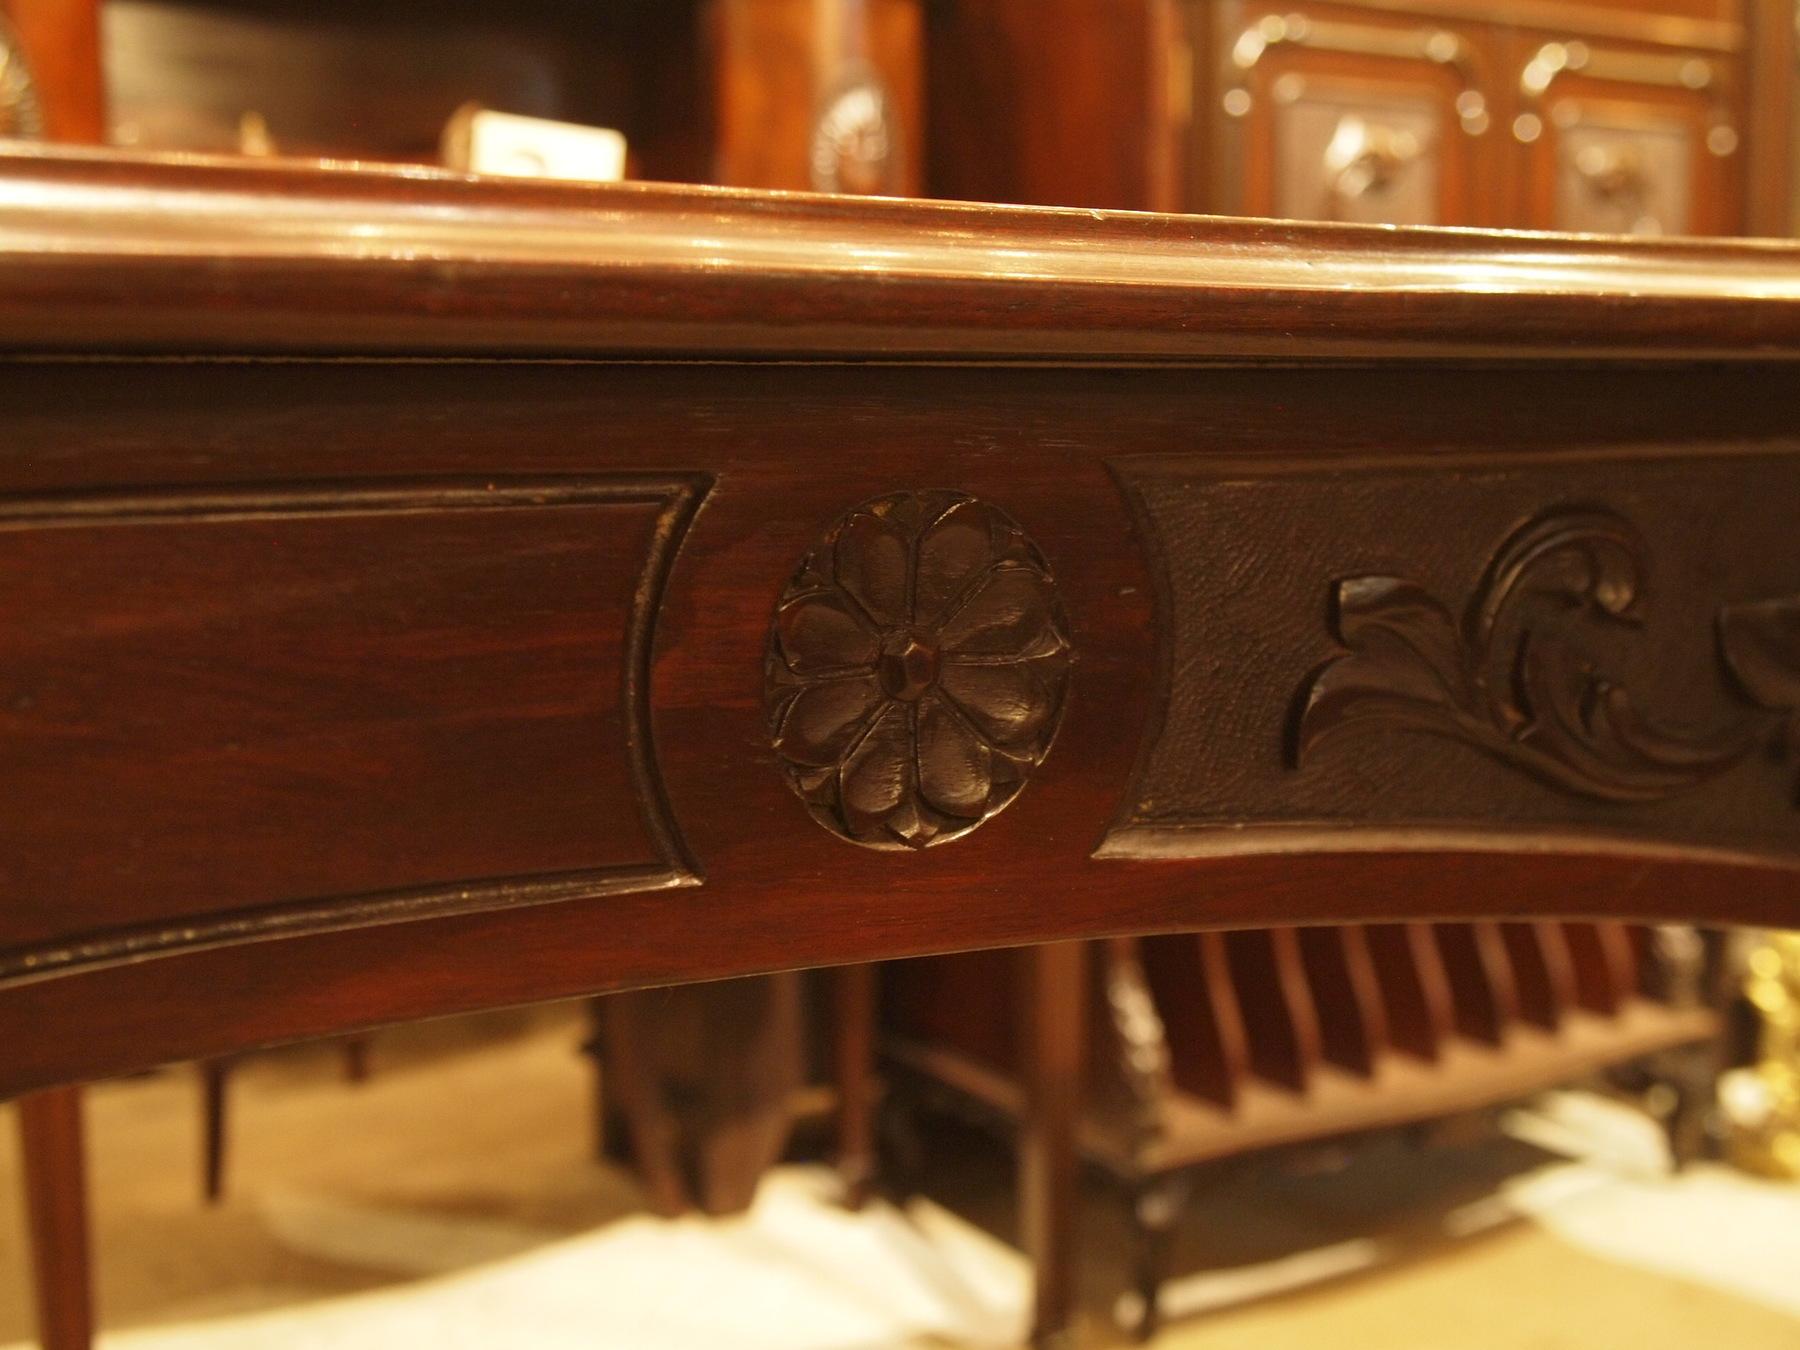 table201120_13.JPG